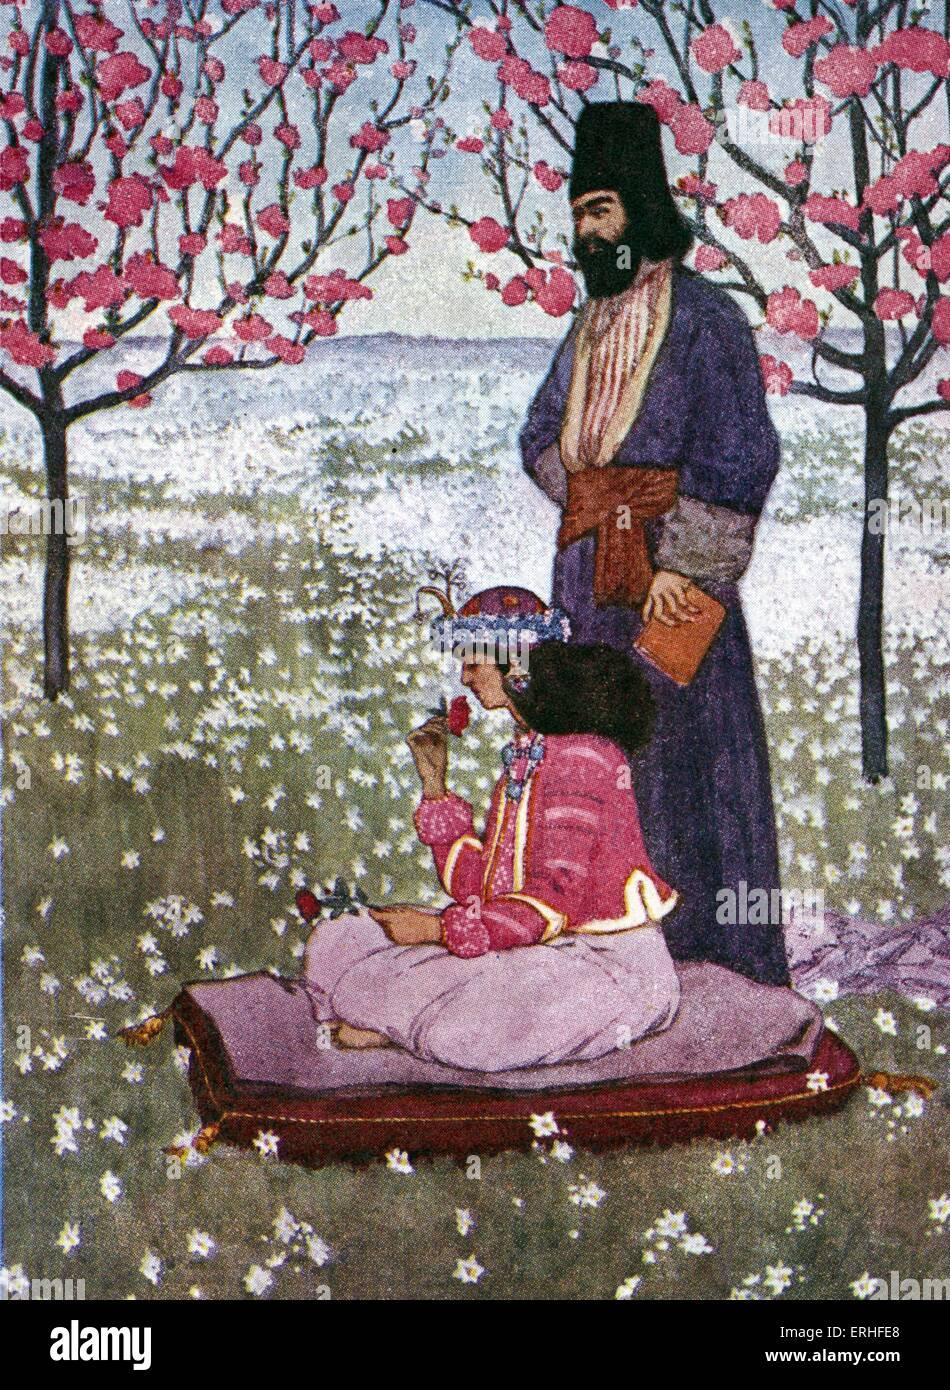 Rubaiyat of Omar Khayyam by Edward FitzGerald ( translation of a selection of poems, originally written in Persian - Stock Image